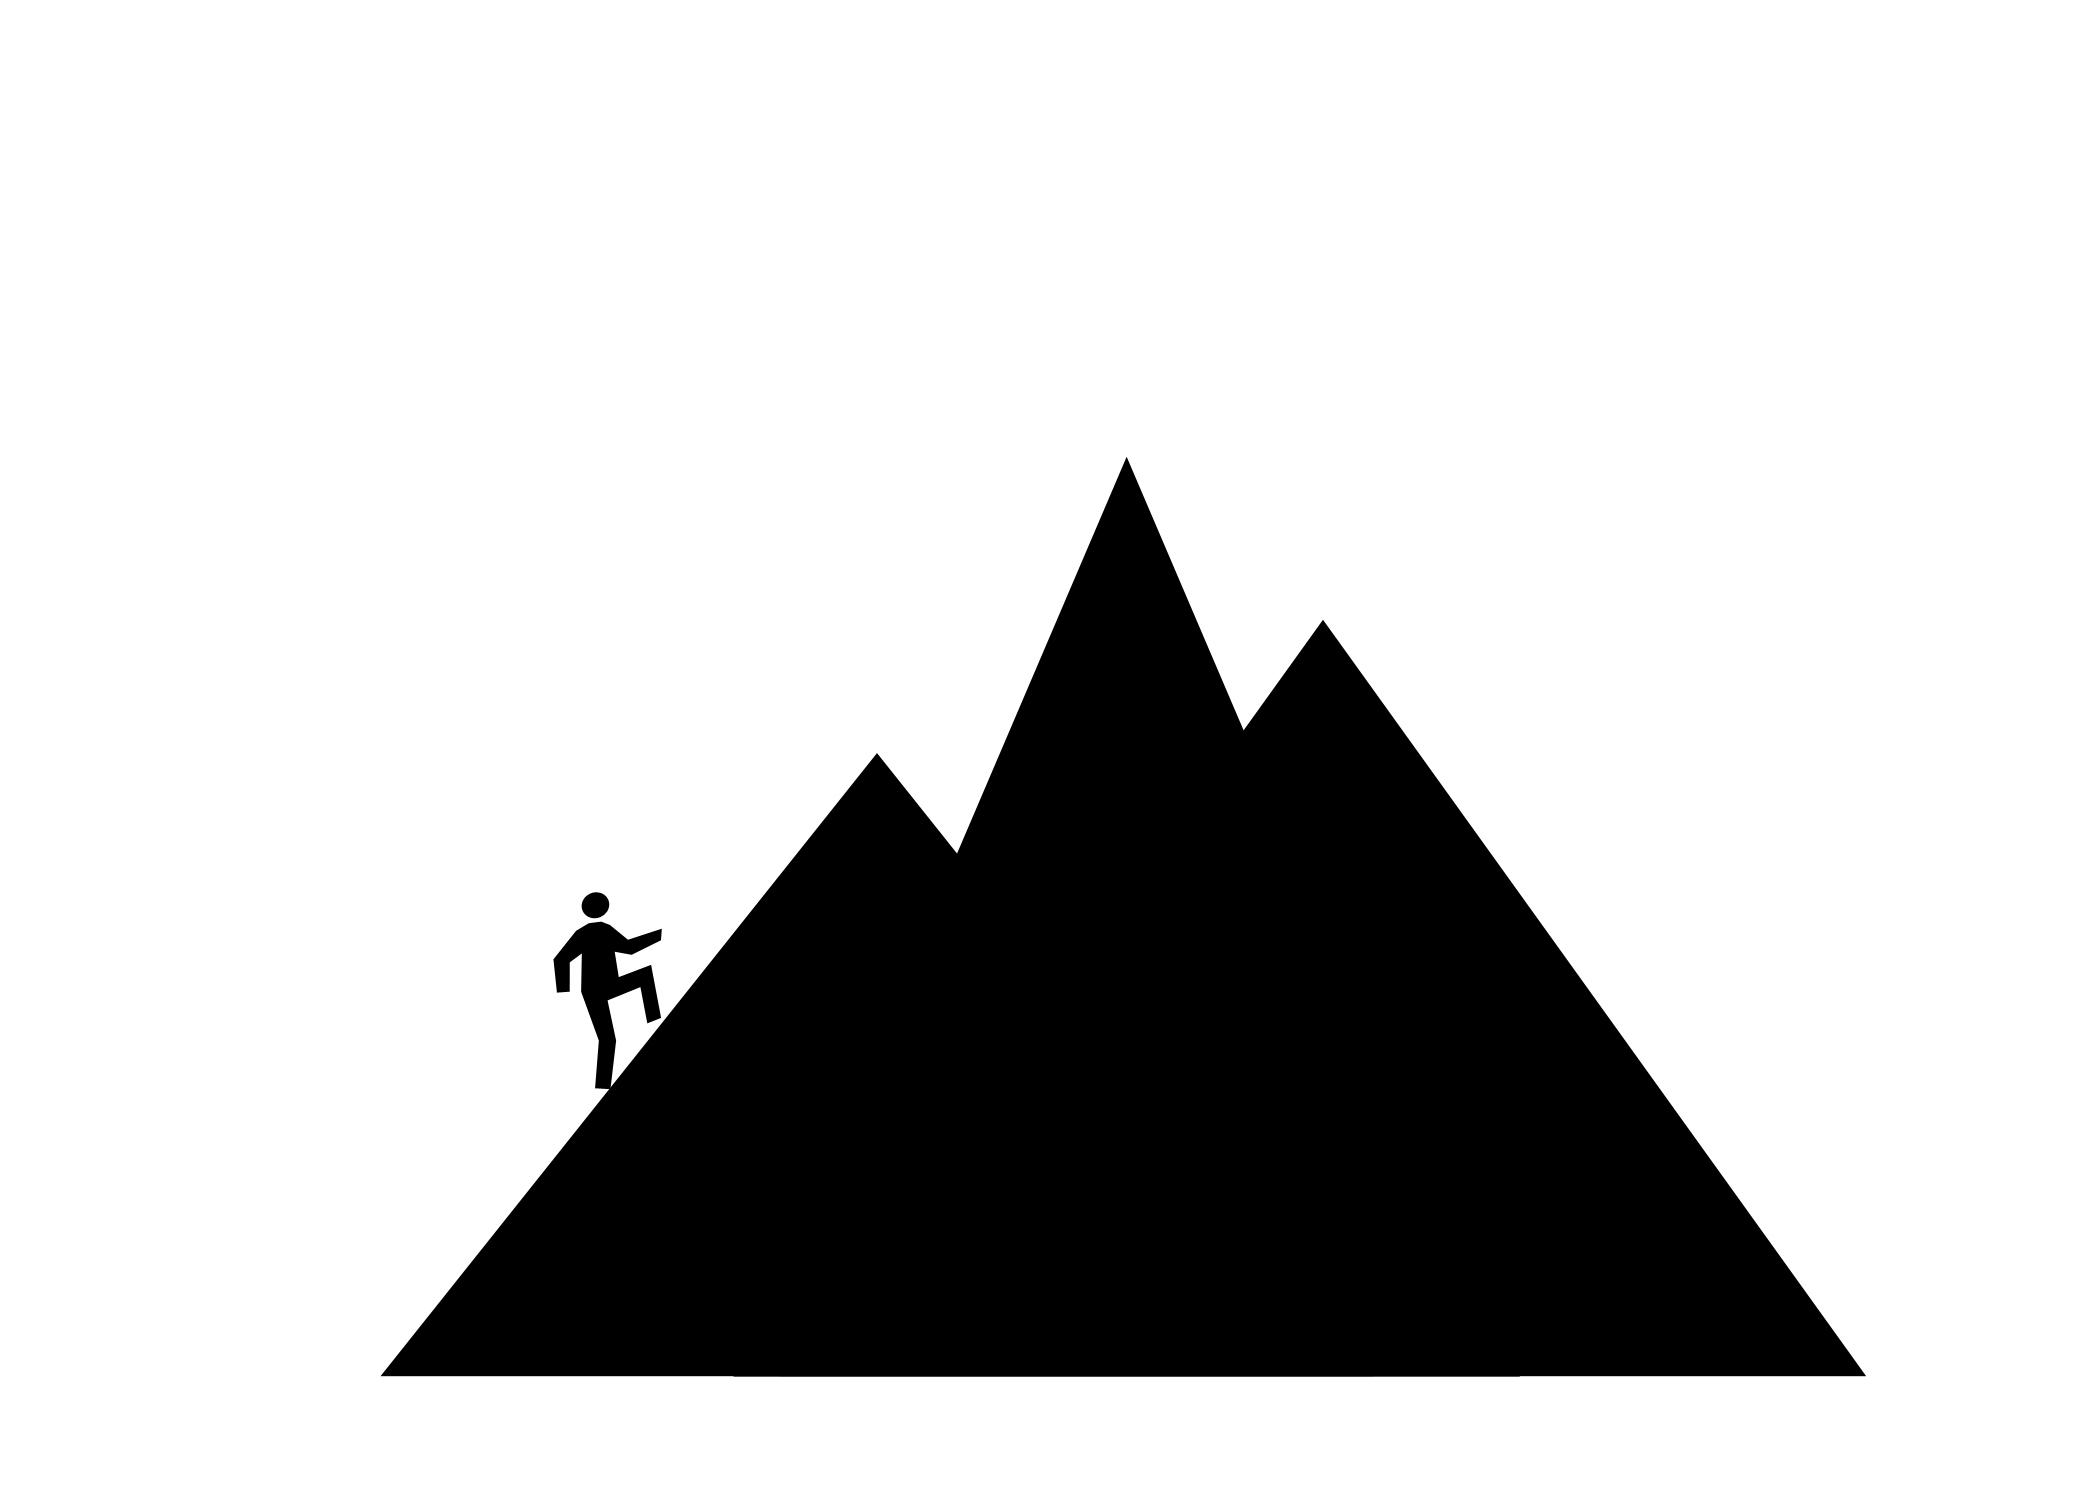 2100x1500 Mountain Silhouette Clip Art – 101 Clip Art